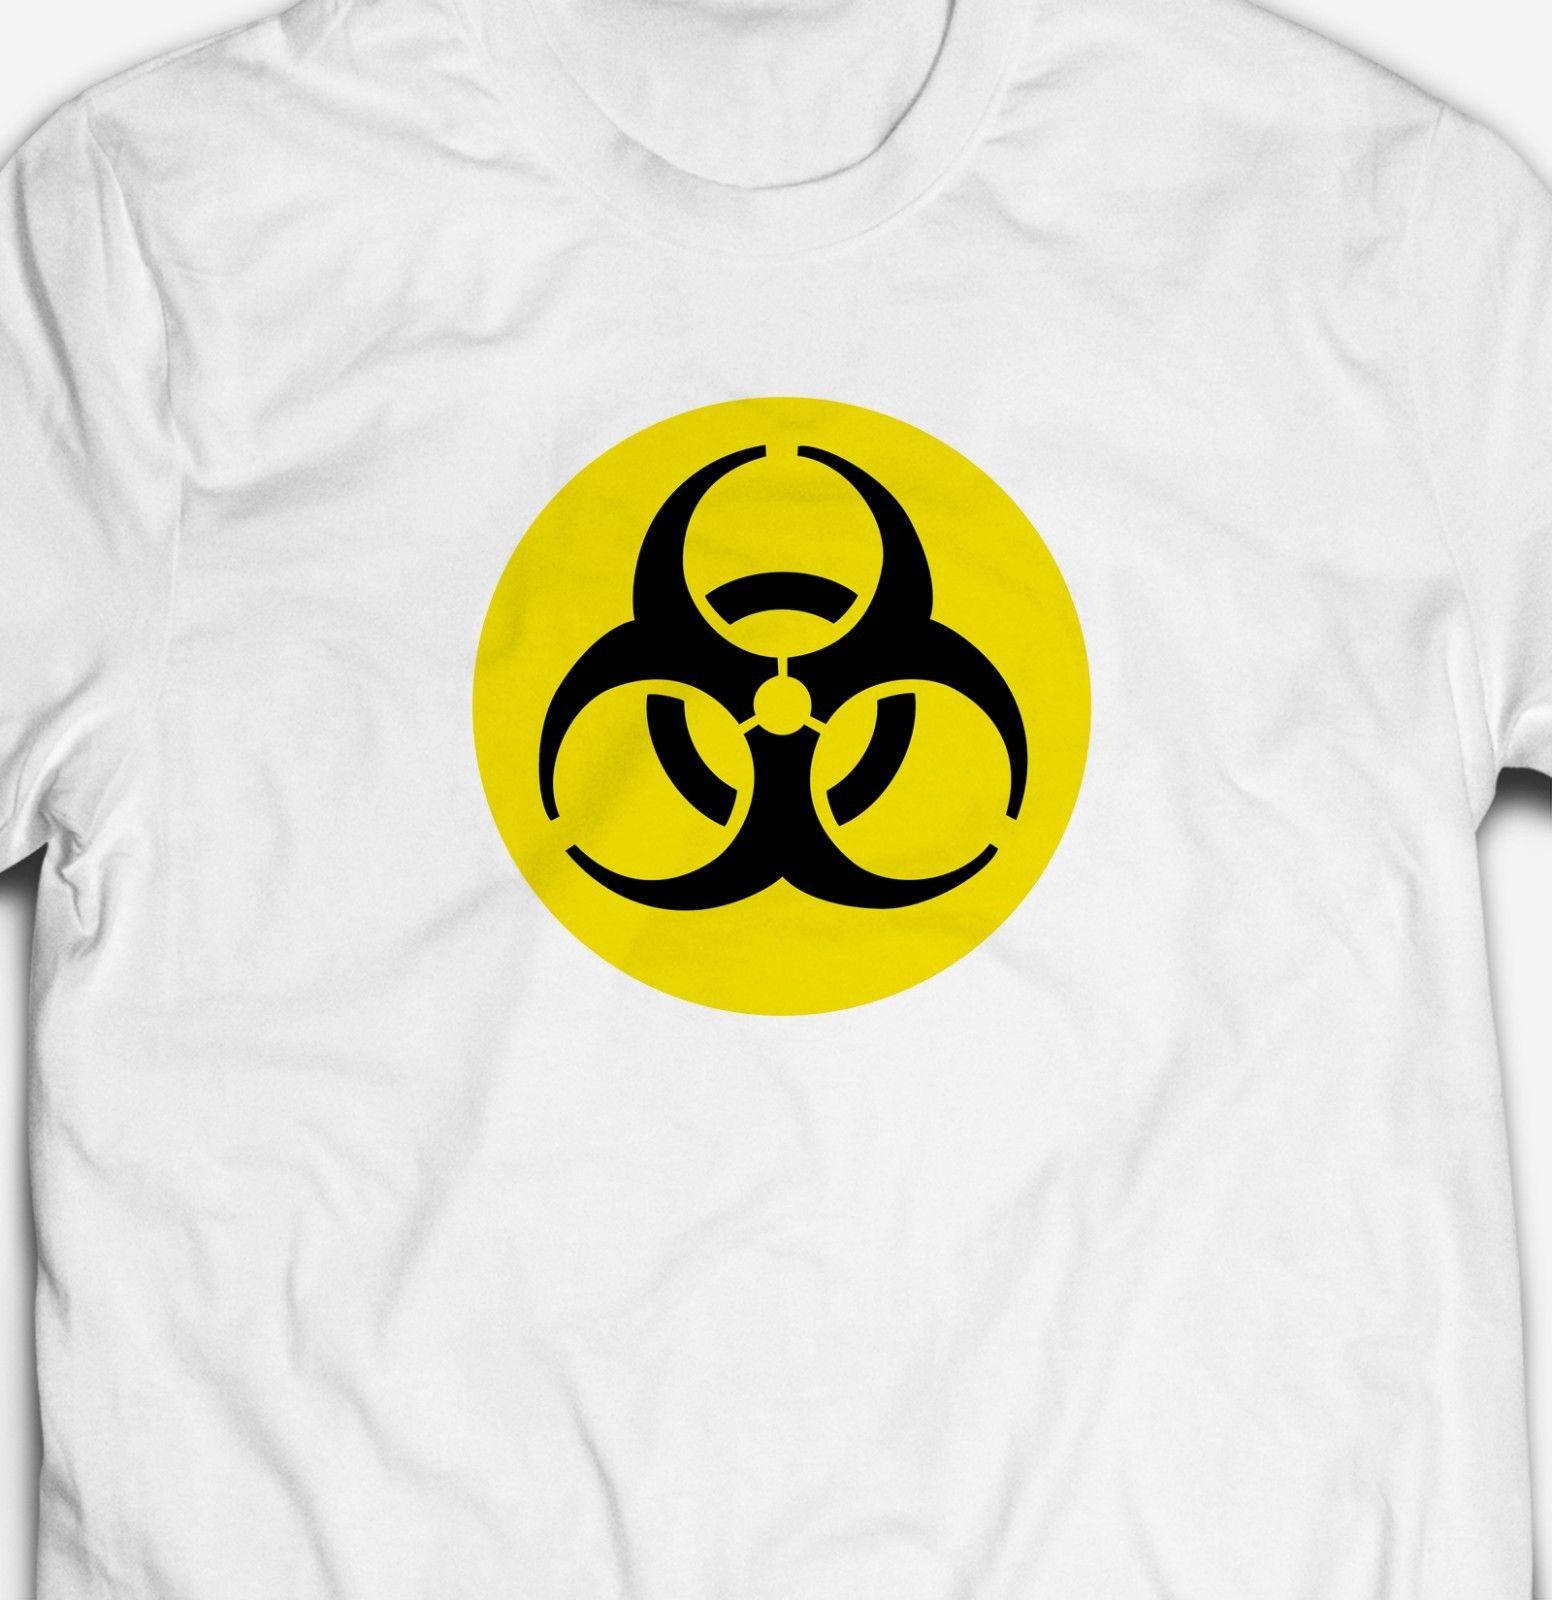 Camiseta clásica Retro Biohazard de advertencia con logo 100% de algodón Biohazard, camiseta moderna de verano para hombre, camiseta fresca con diseño informal